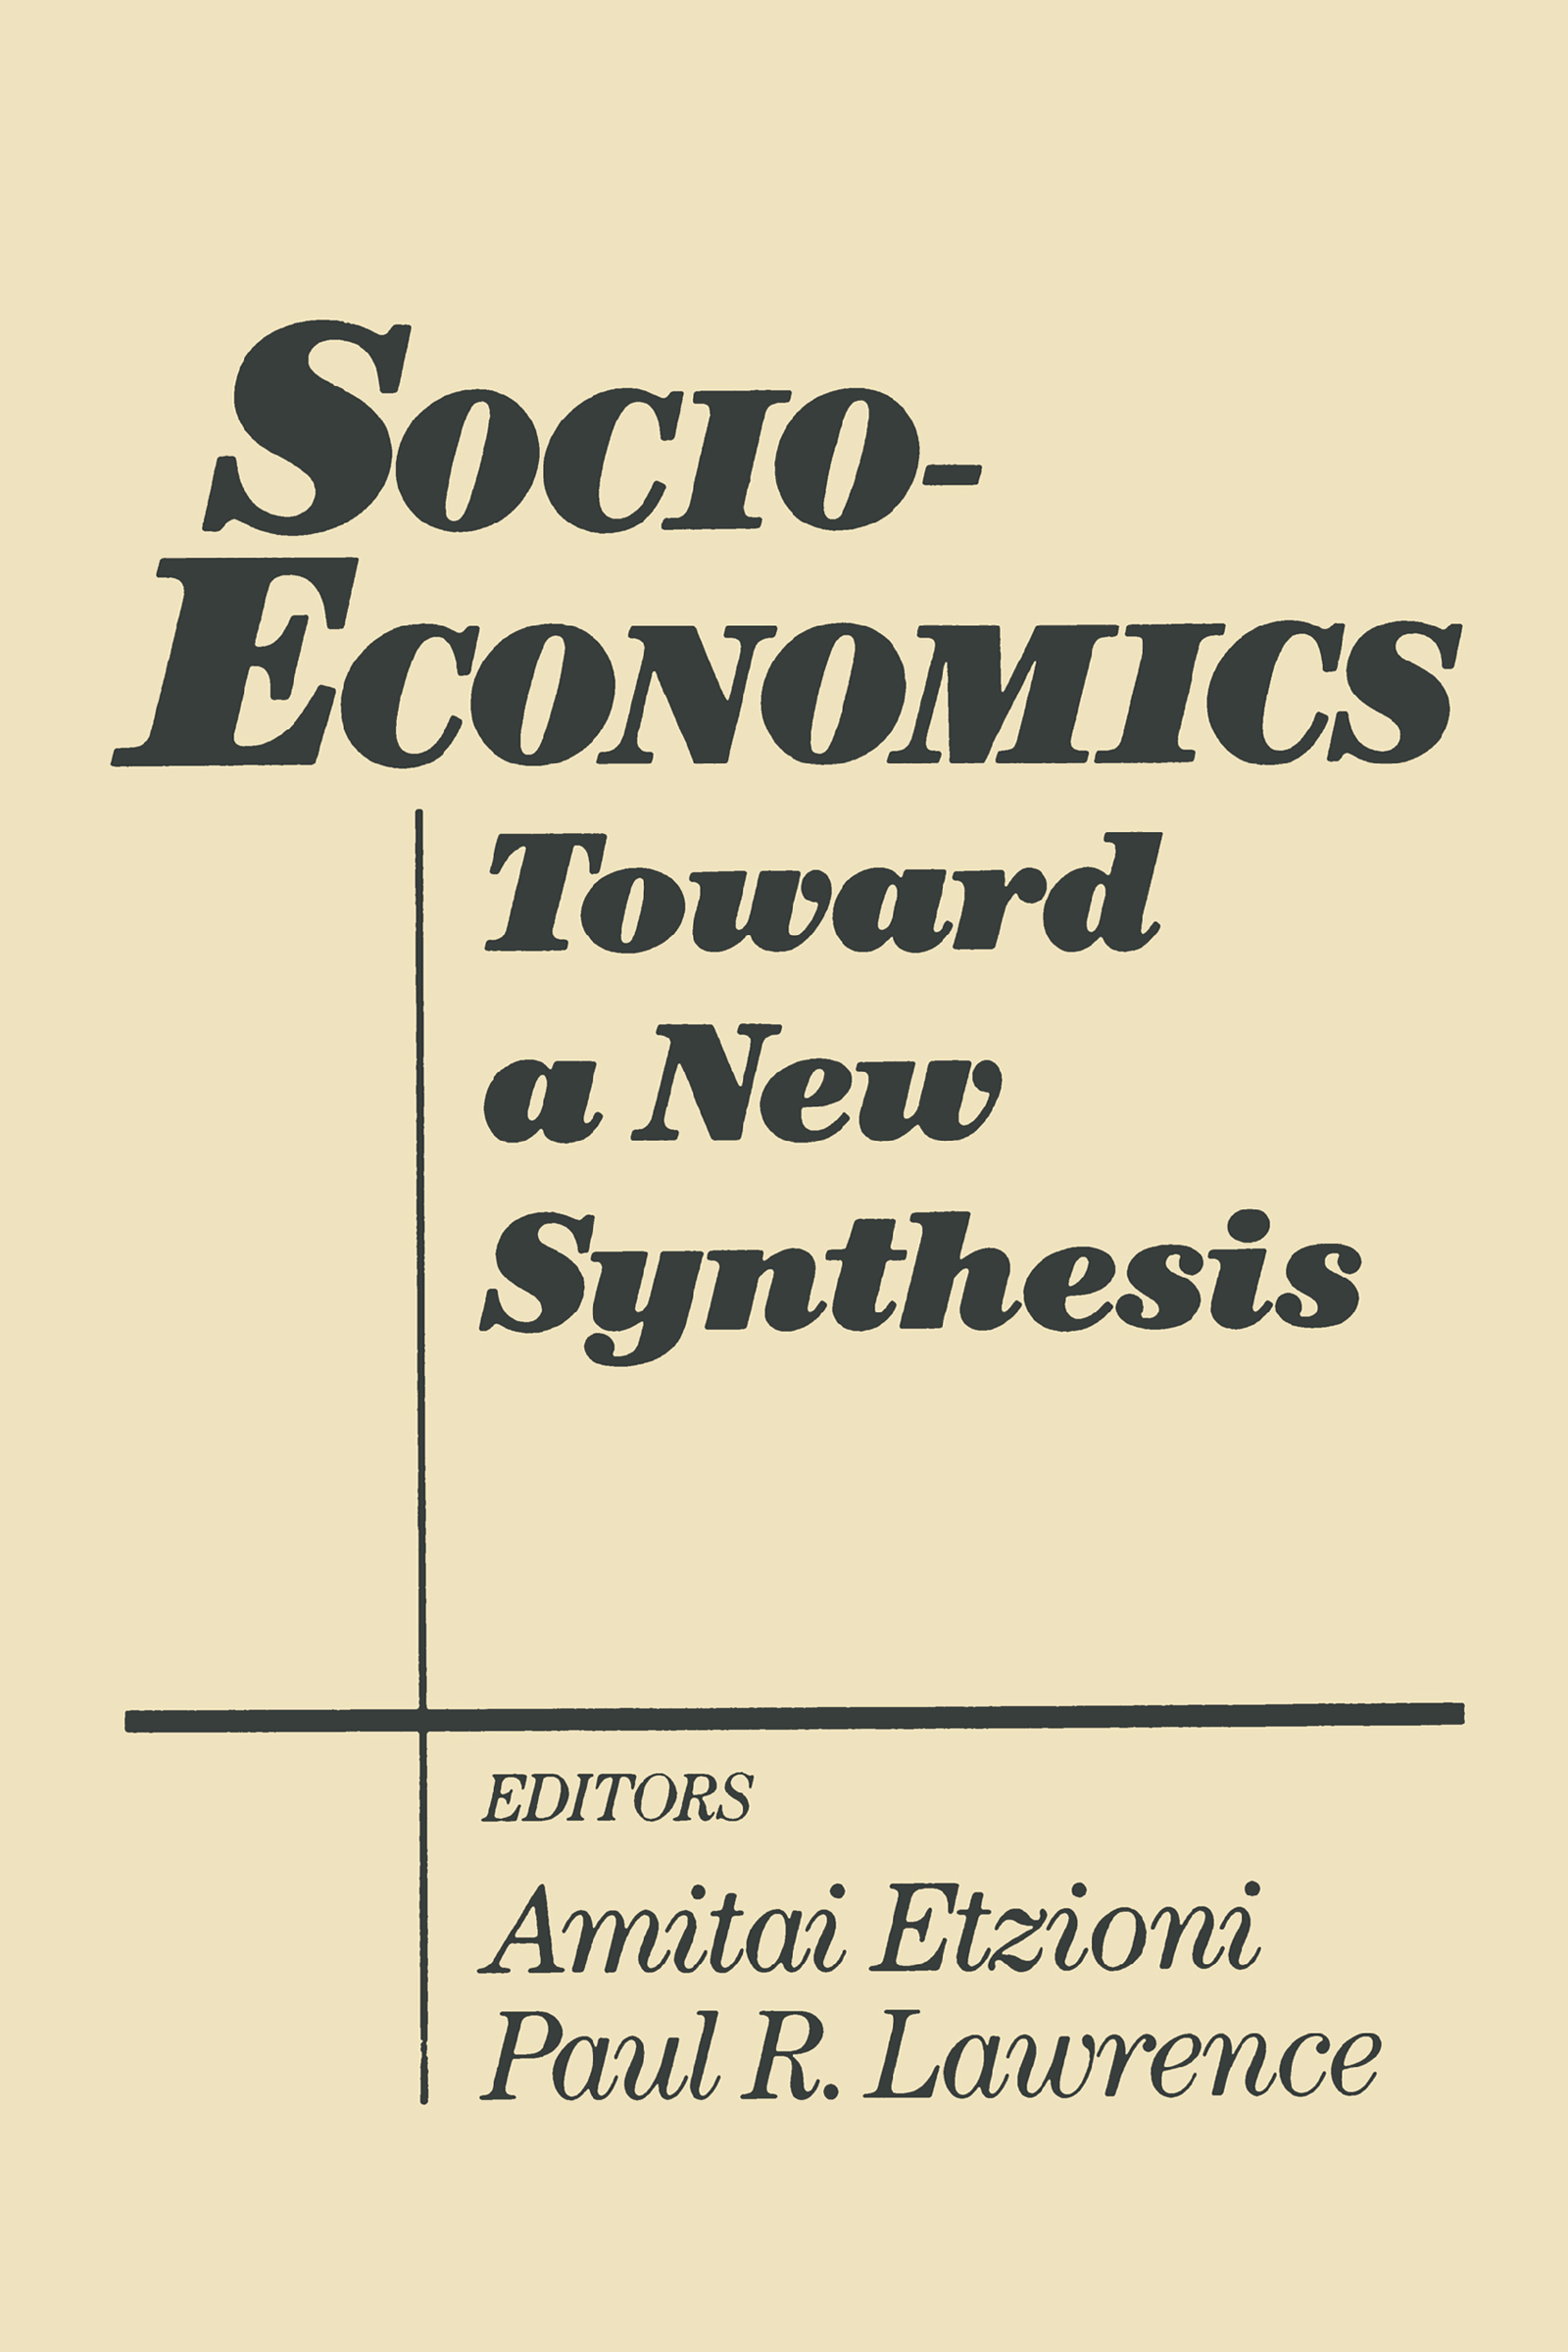 Socio-economics: Toward a New Synthesis